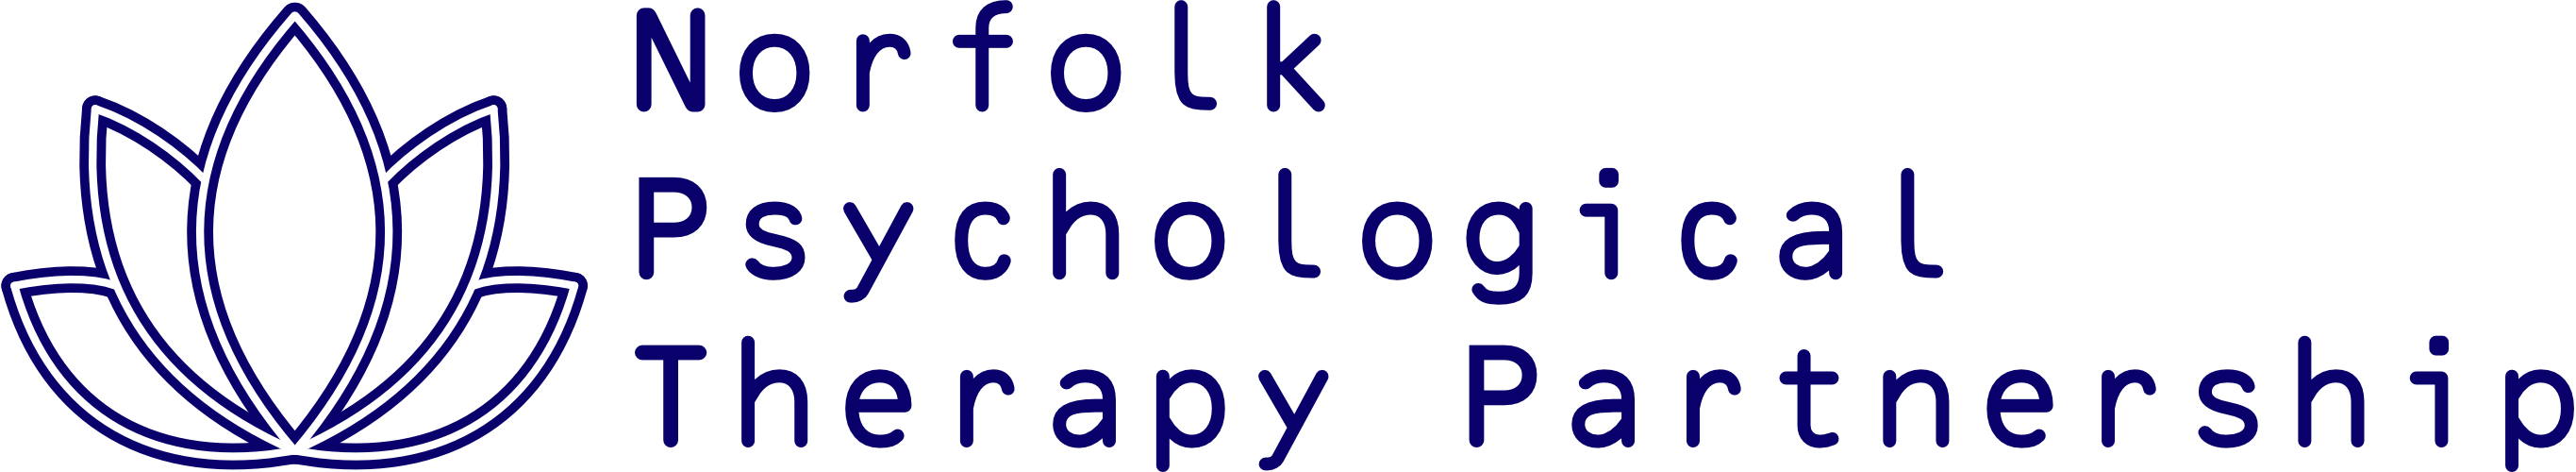 Norfolk Psychological Therapy Partnership